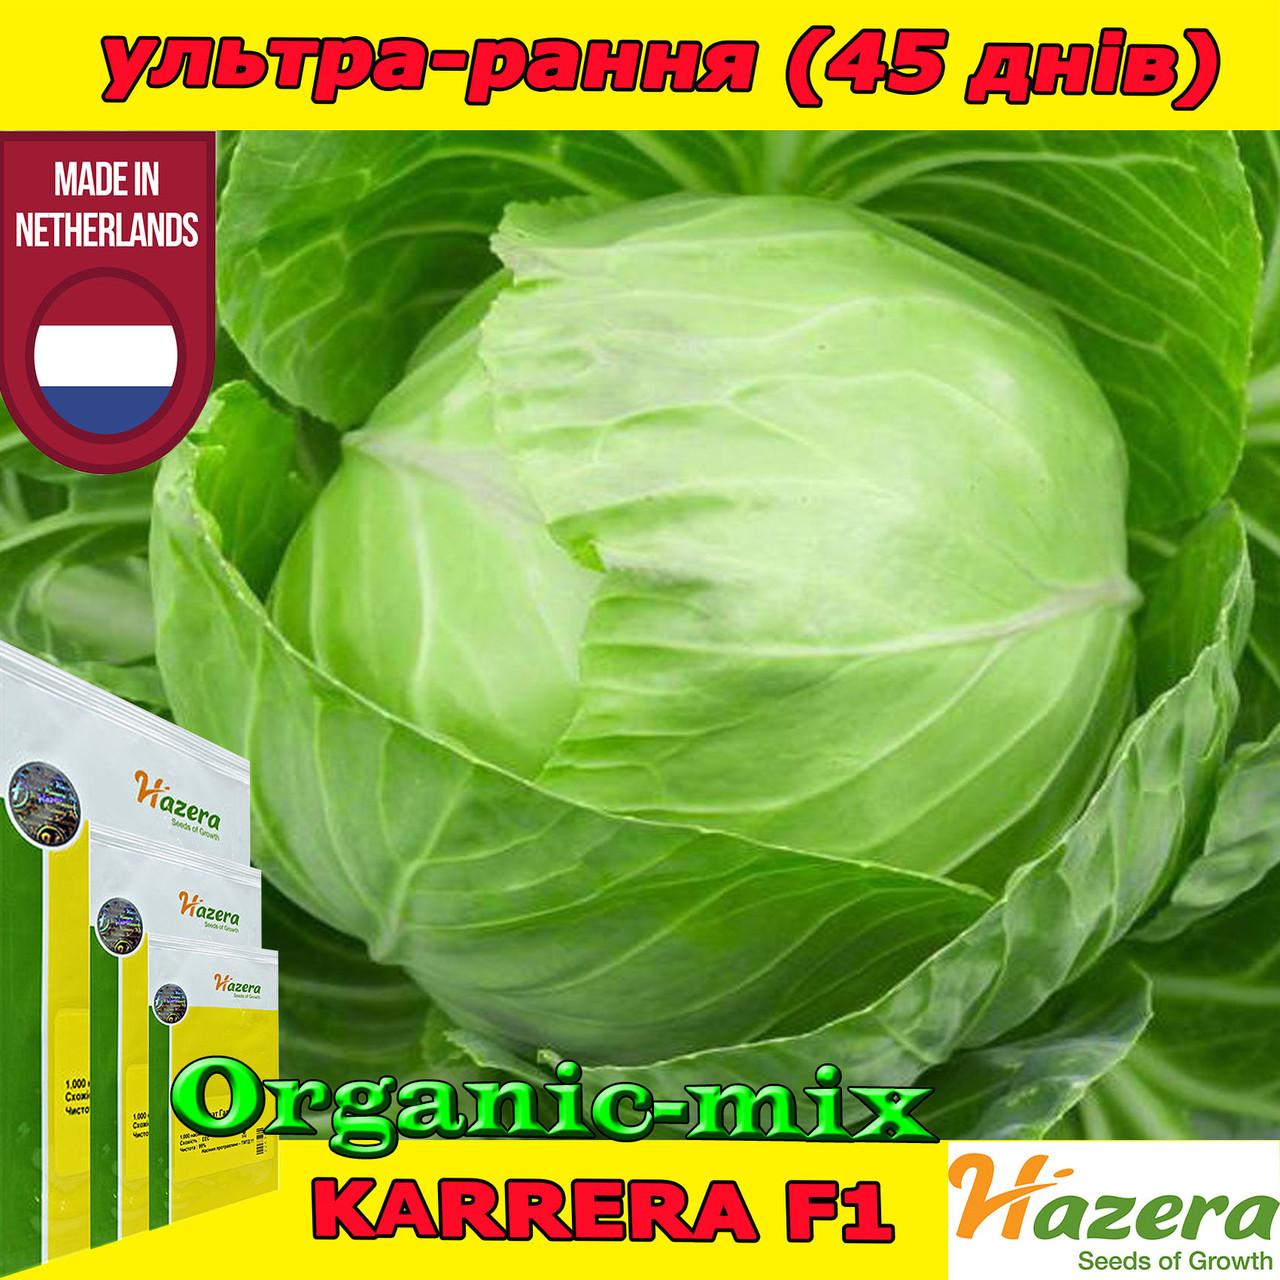 КАРРЕРА F1 / KARRERA F1, семена ультраранней капусты, 2500 семян, ТМ HAZERA (Нидерланды)